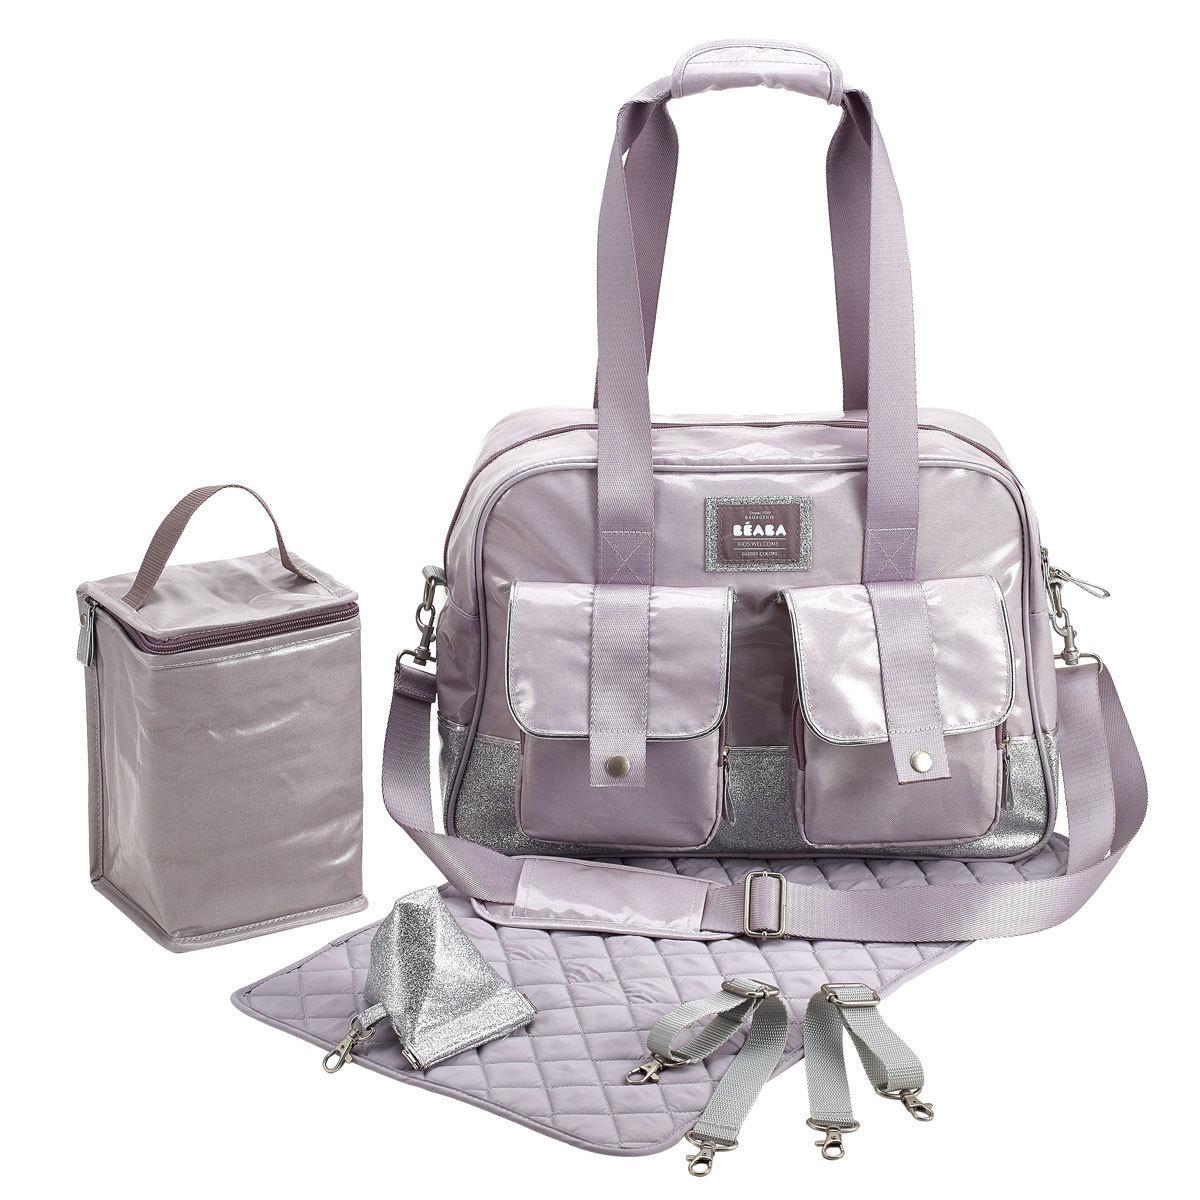 b aba sac langer monaco silver sac langer b aba sur l 39 armoire de b b. Black Bedroom Furniture Sets. Home Design Ideas